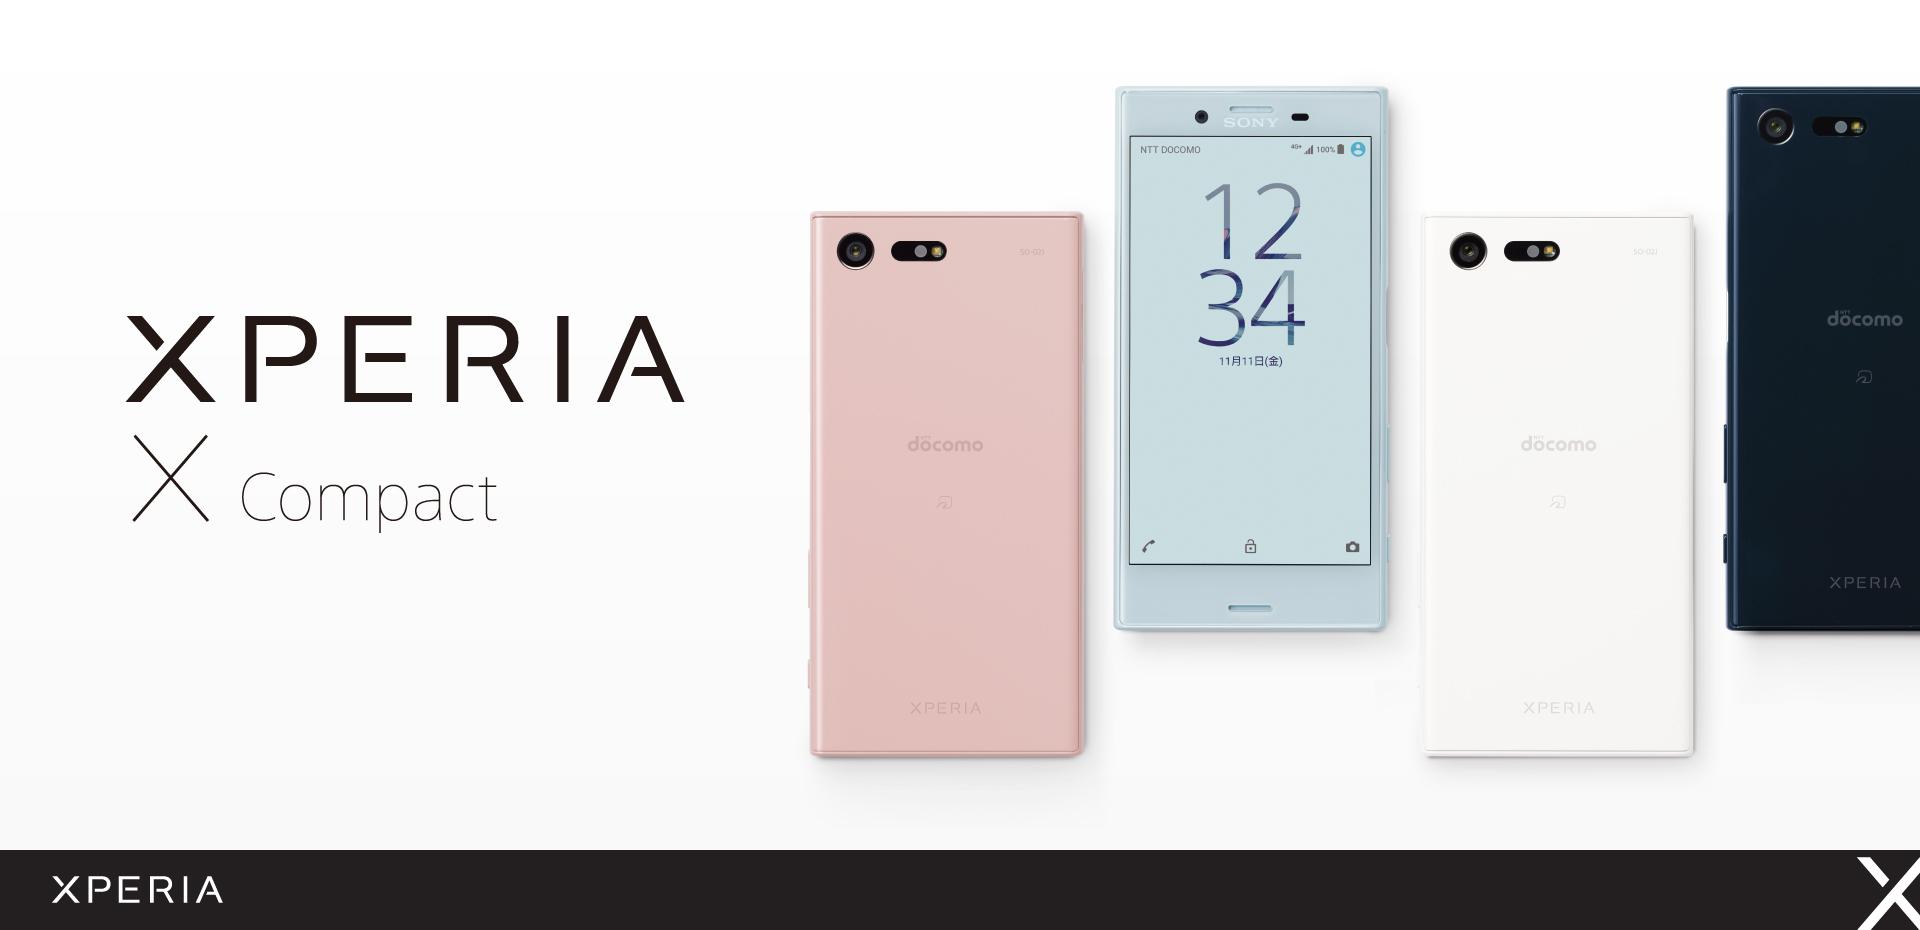 Xperia X compactオフィシャル画像